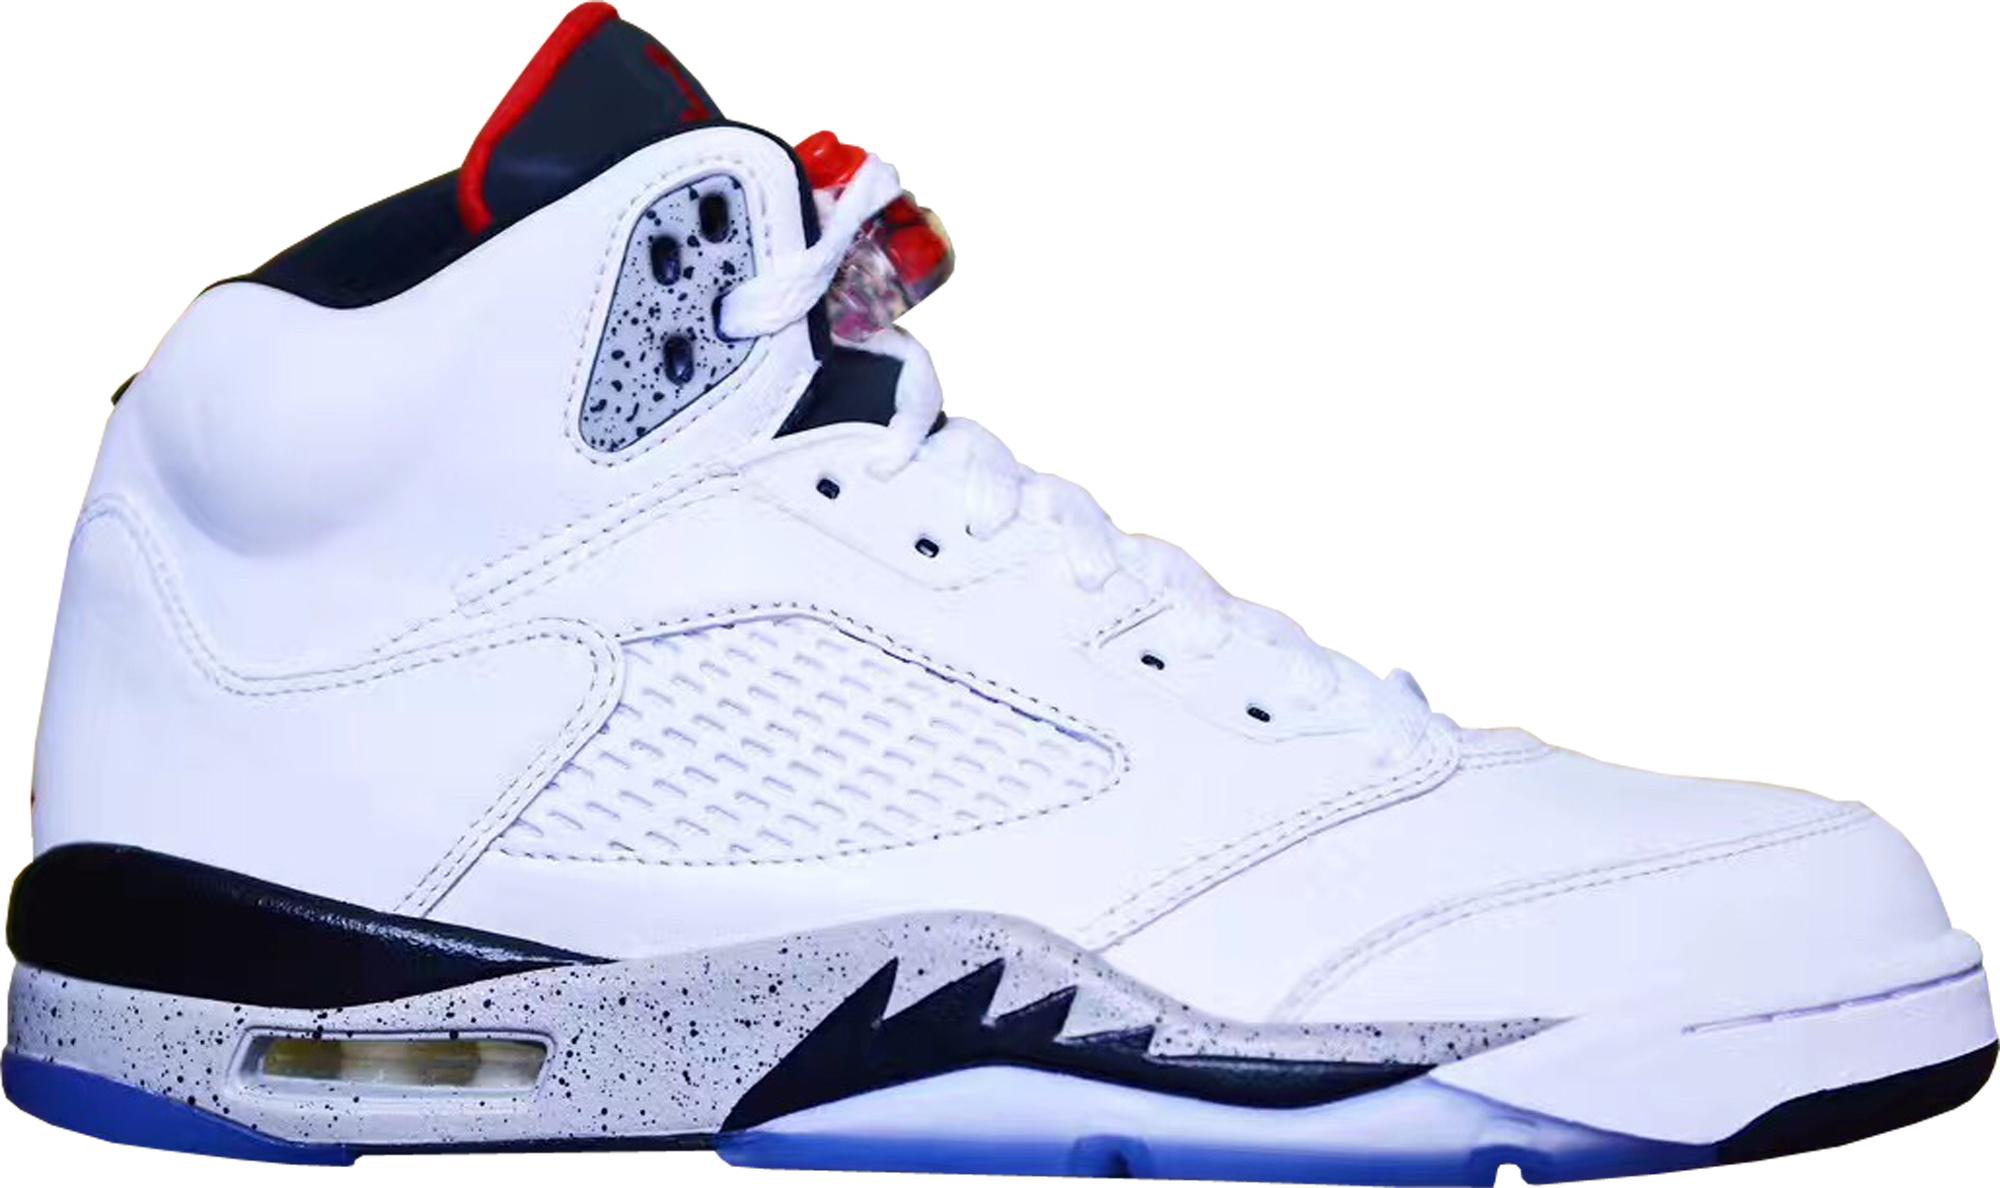 Jordan 5 Retro White Cement